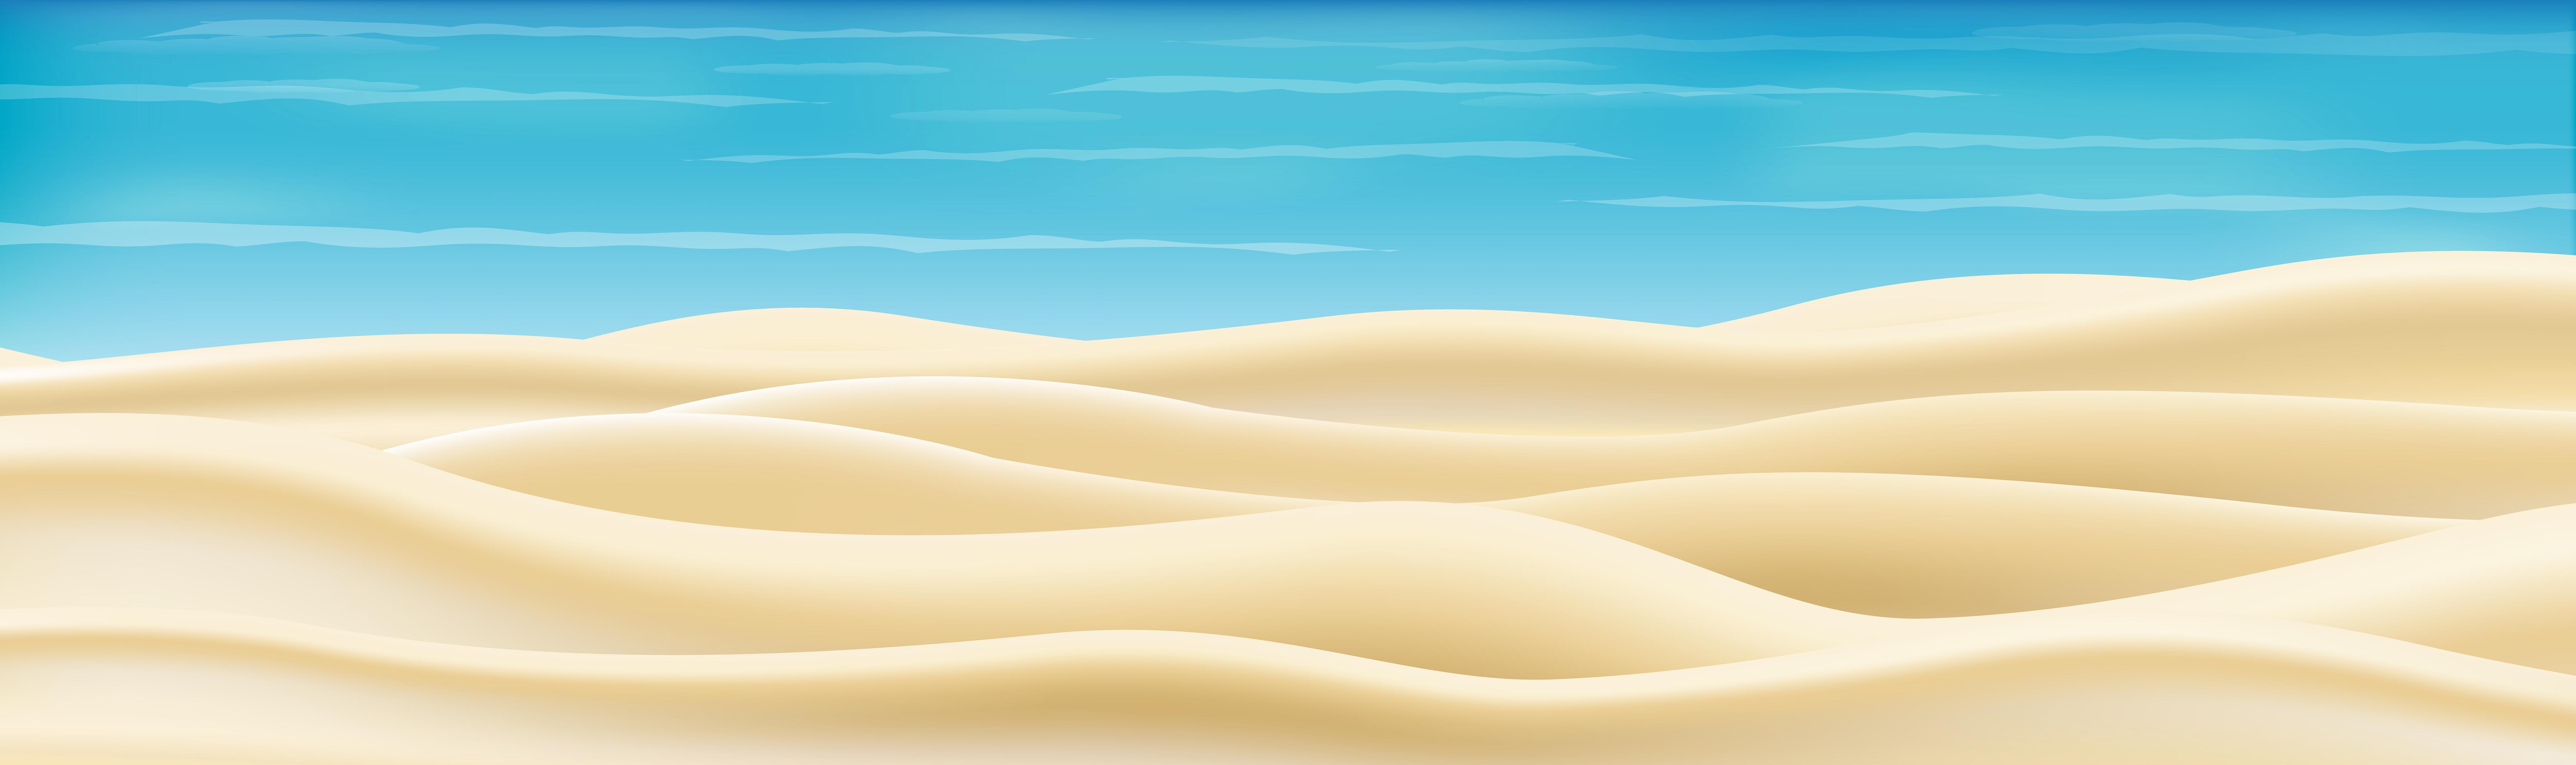 Sea ground transparent png. Landscape clipart beach water